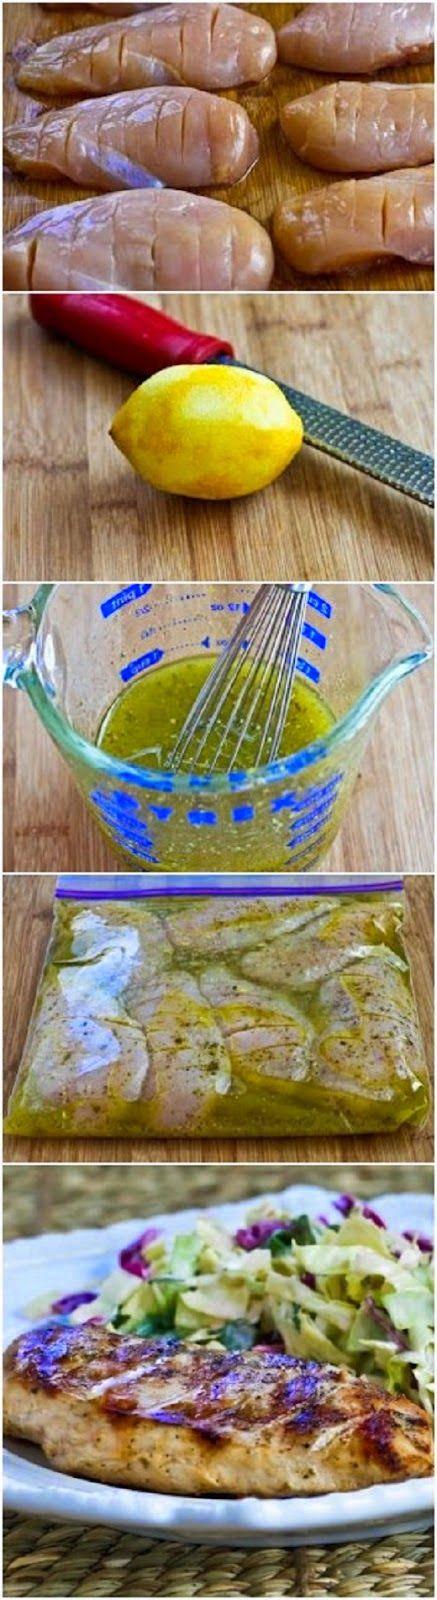 New Food & drink: Very Greek Grilled Chicken